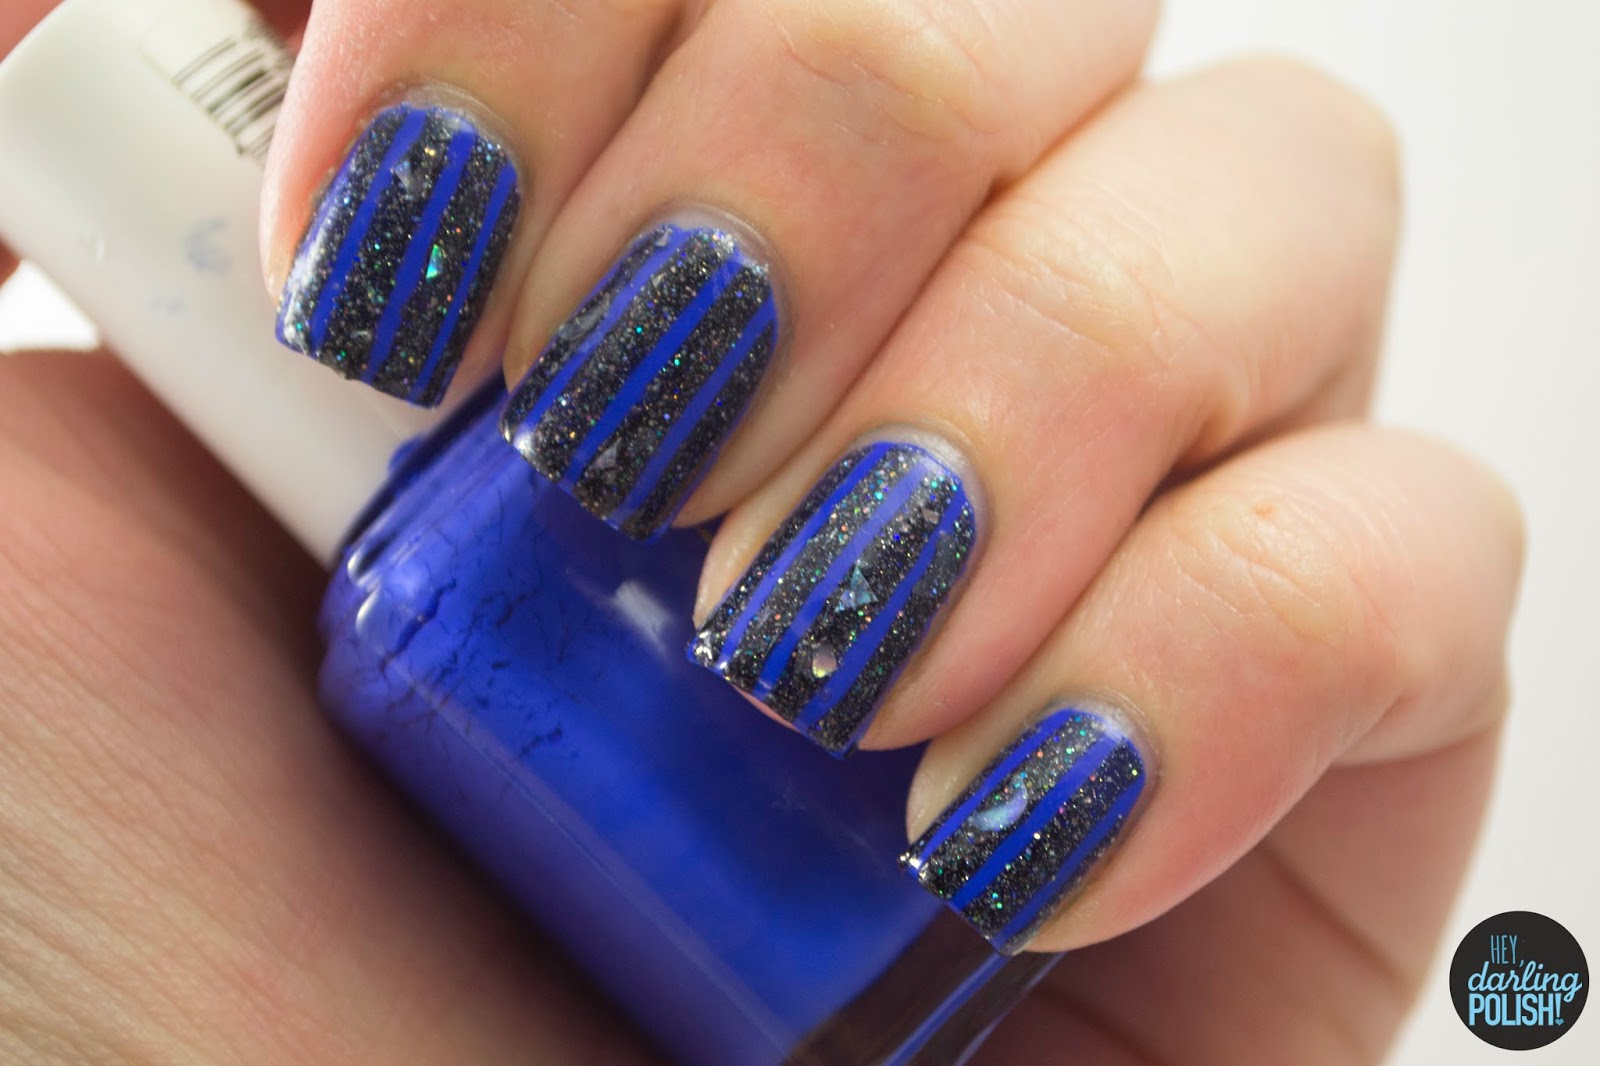 nails, nail art, nail polish, polish, stripes, blue, glitter, indie, indie polish, hey darling polish, lacquer legion, lucky, LLlucky, LynBDesigns